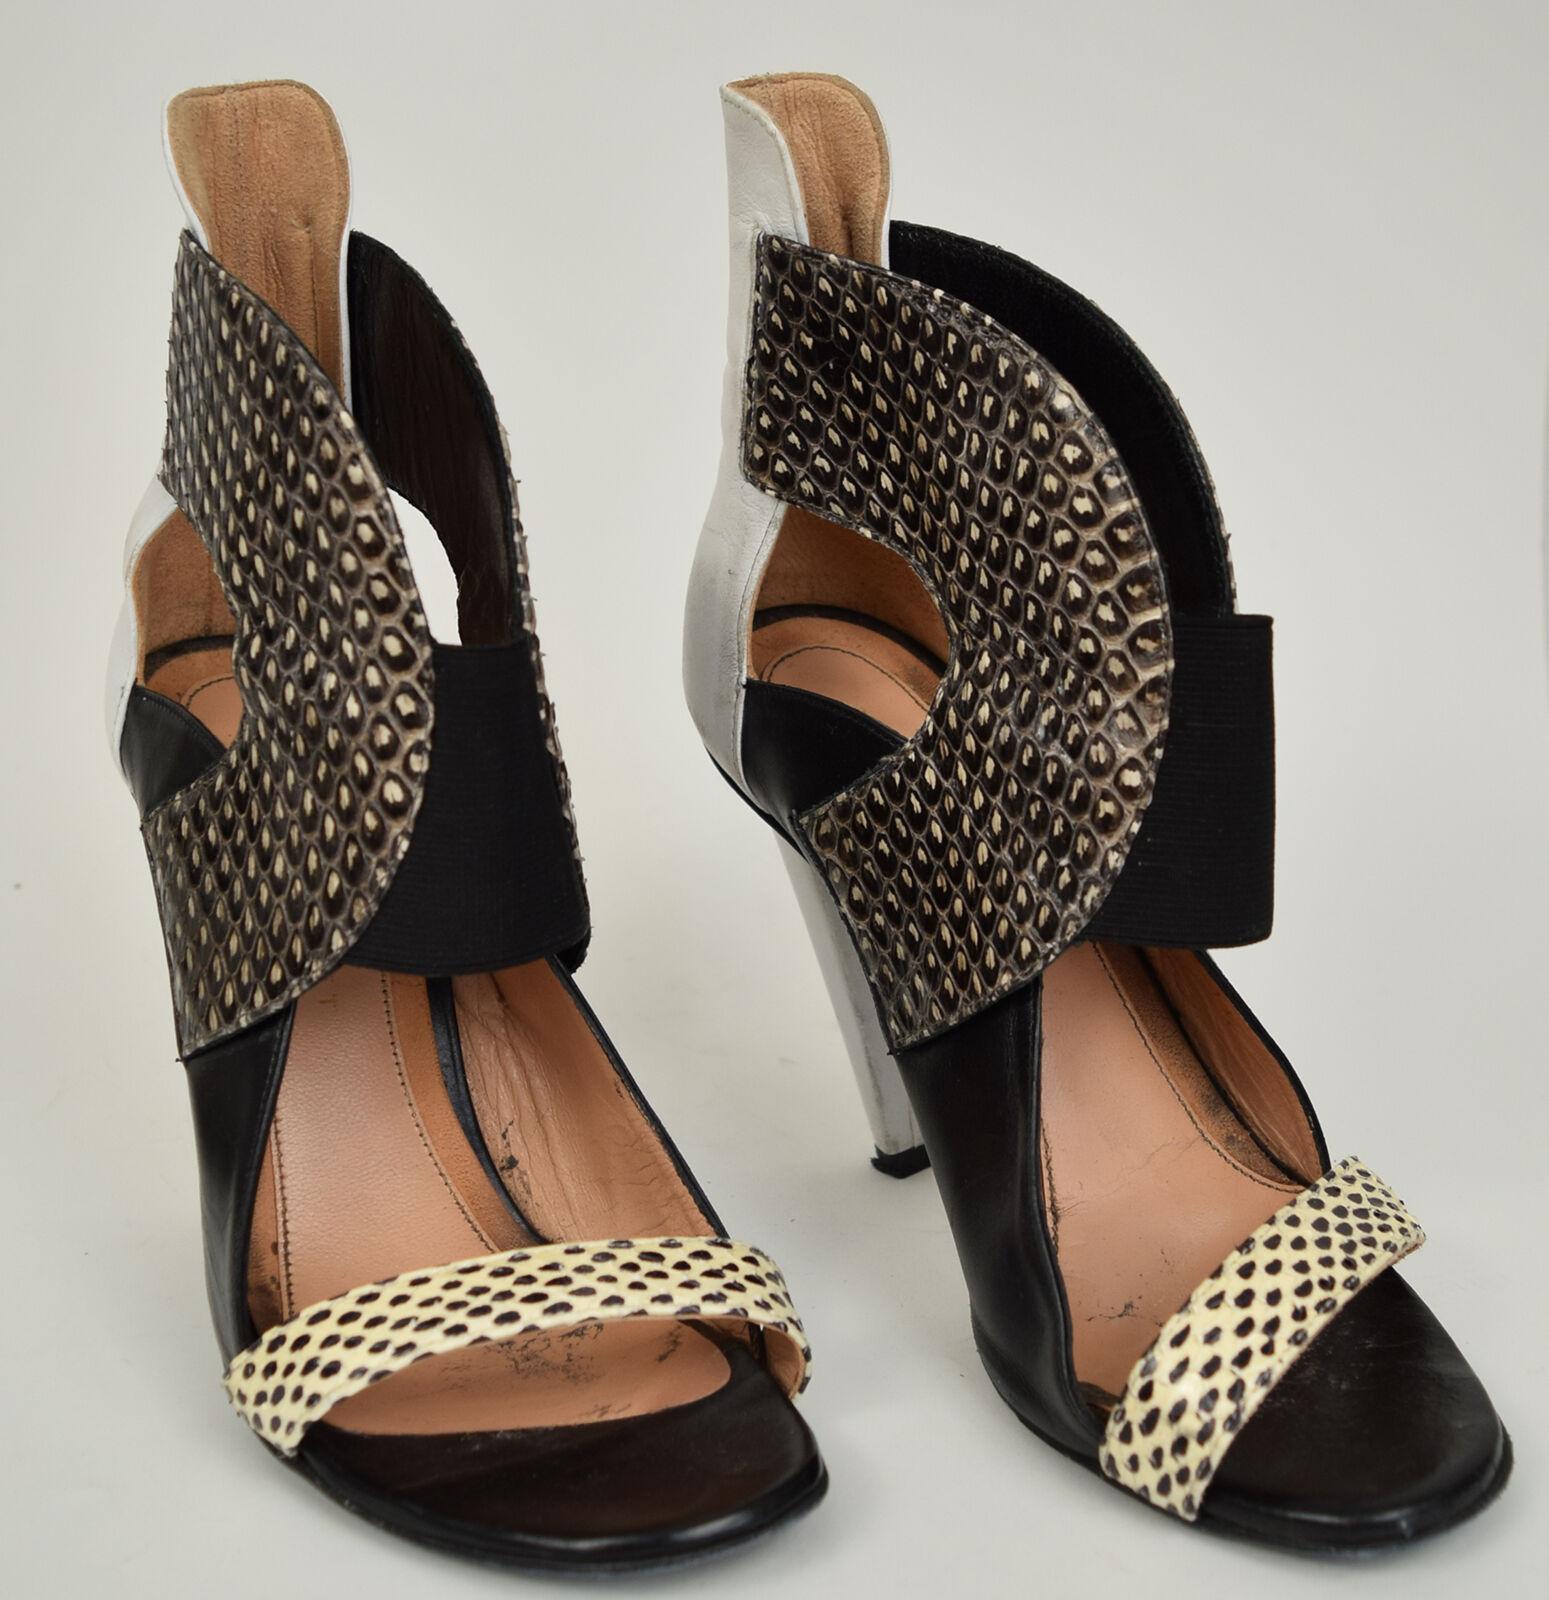 prezzi bassissimi Roland Roland Roland Mouret Sandals nero Snakeskin bianca High Heel scarpe 36 donna  rivenditori online